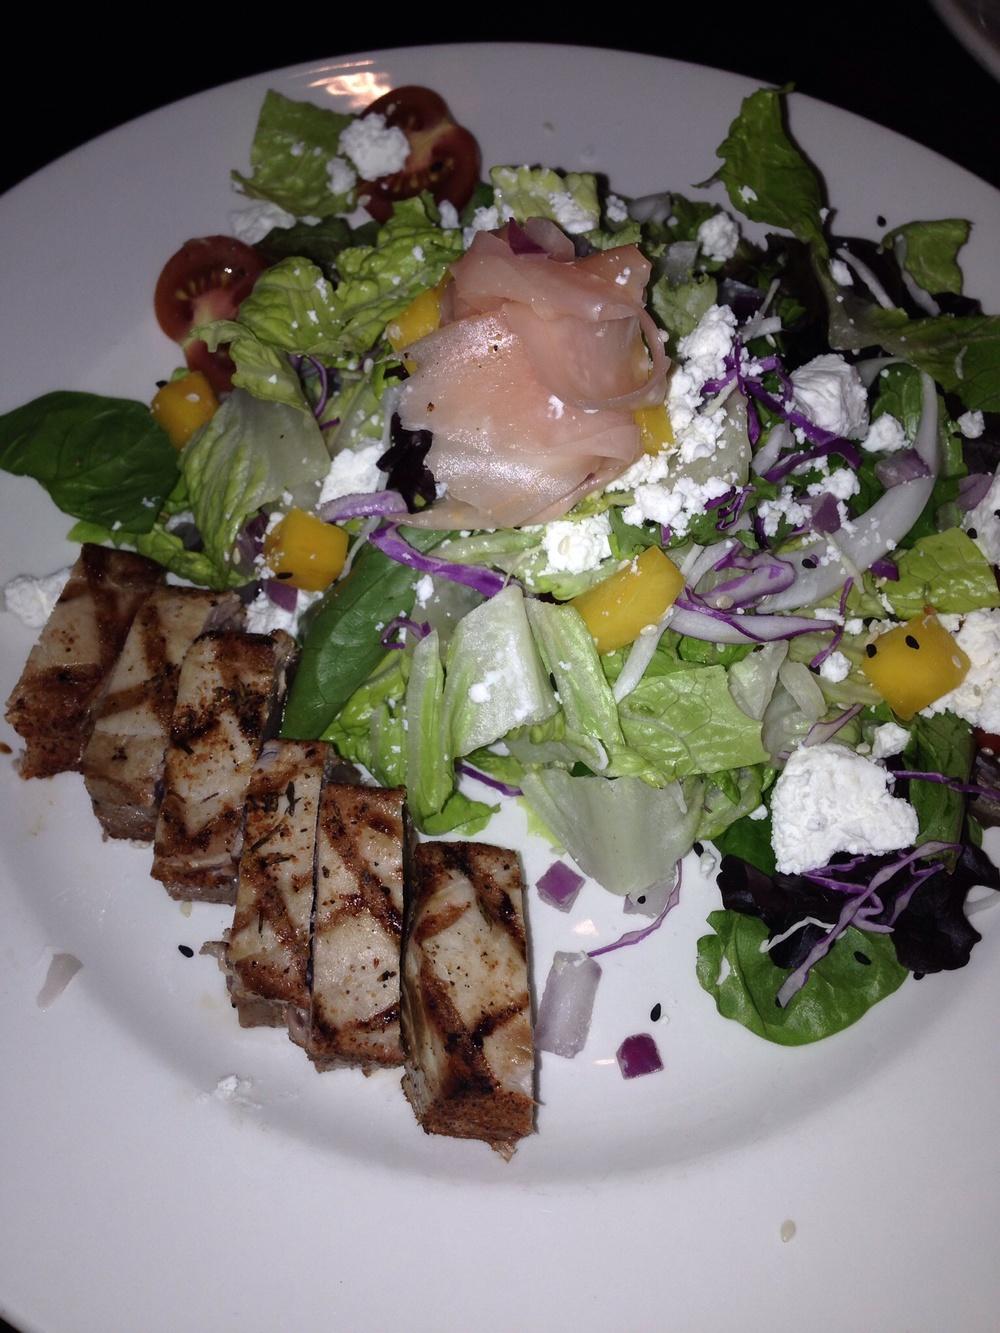 131 Main - Seared Tuna Salad